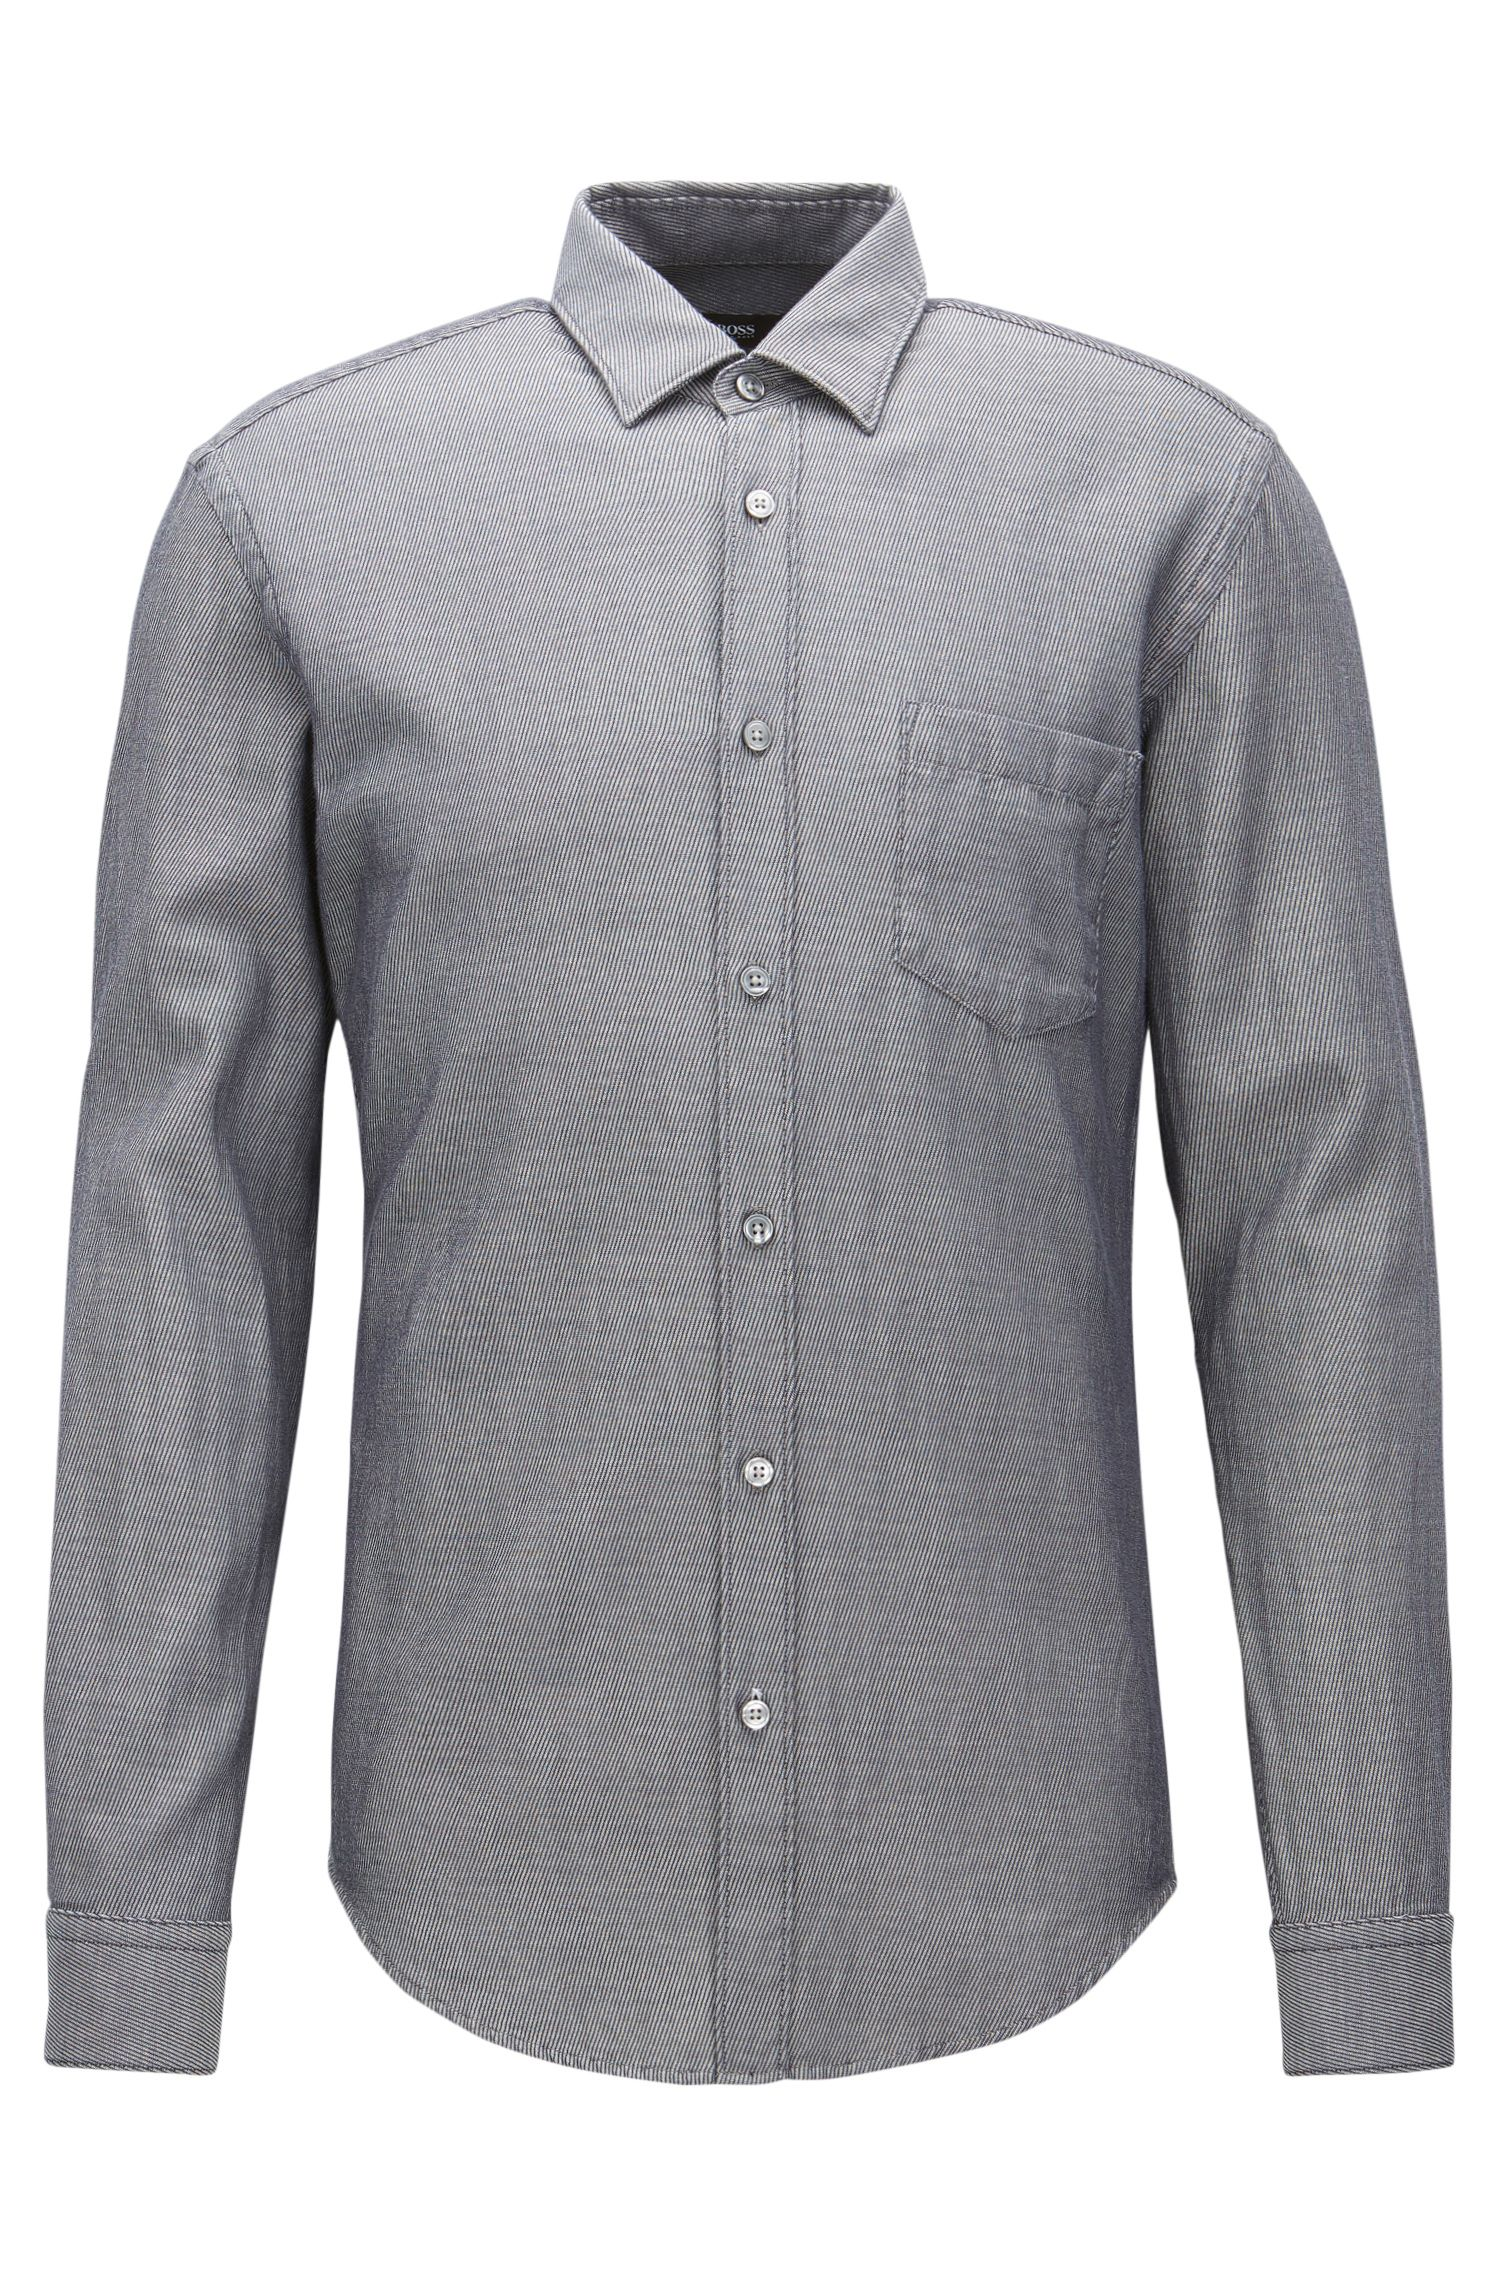 'Ronni P' | Selvidge Denim Twill Button Down Shirt